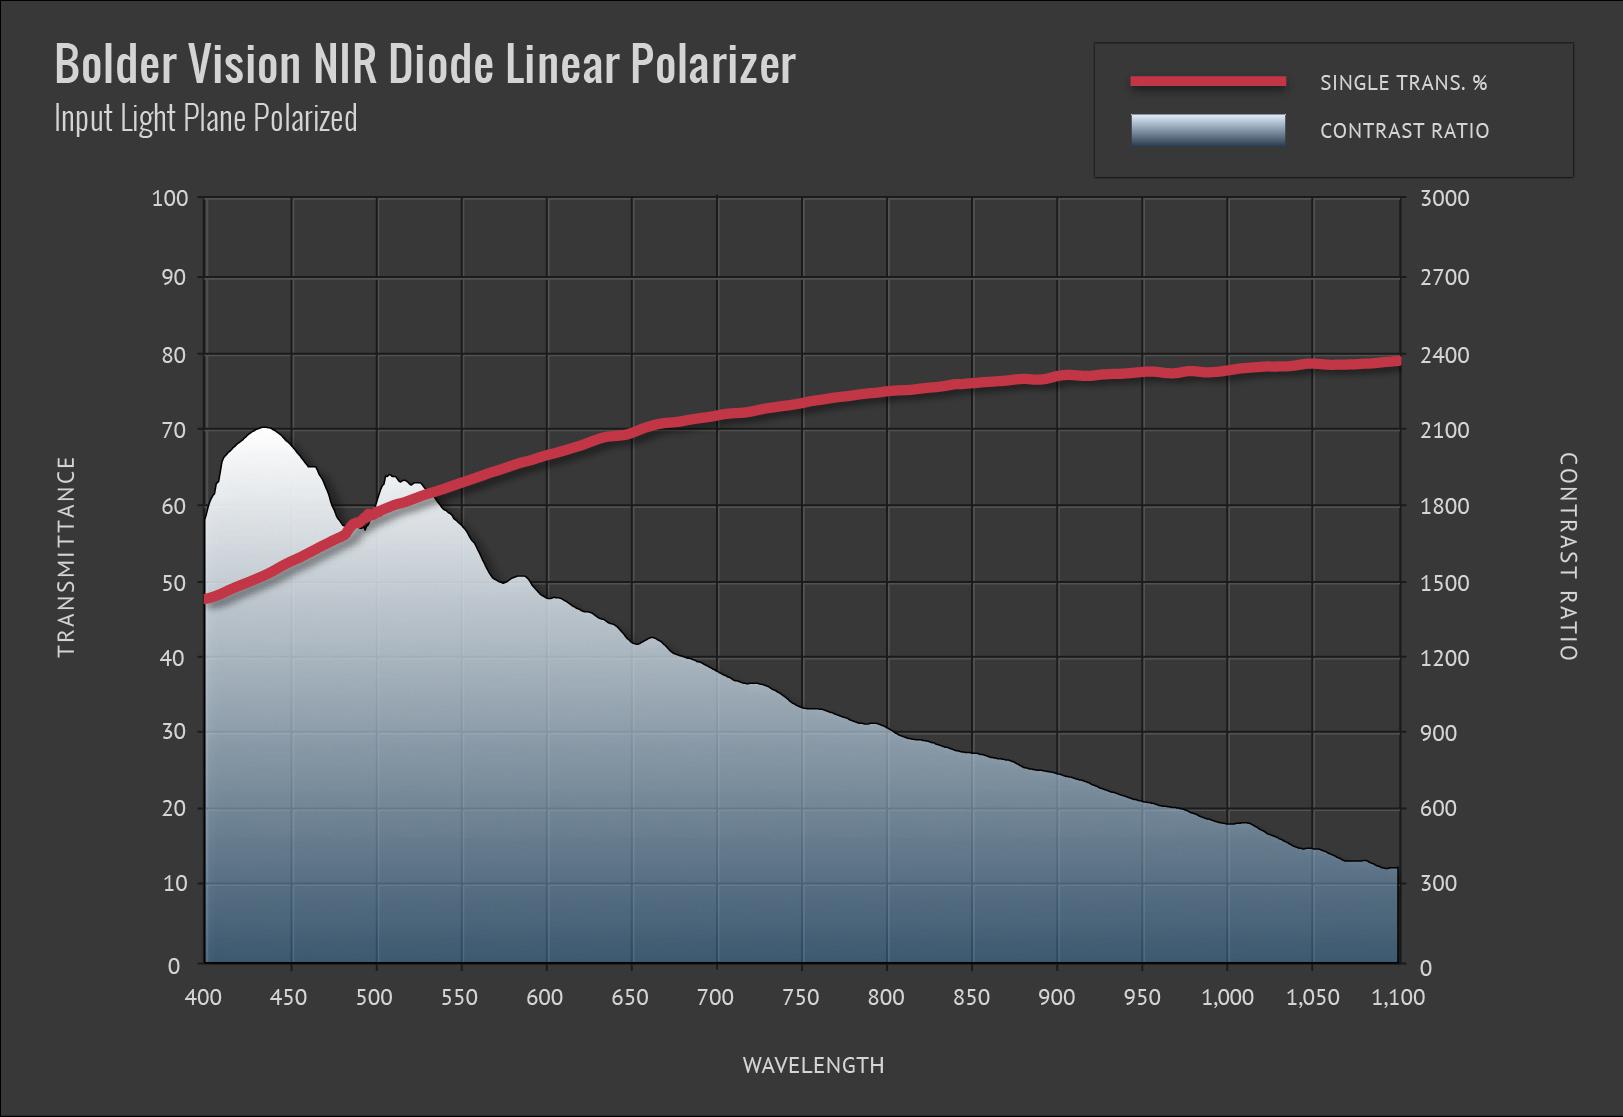 Bolder Vision NIR Diode Linear Polarizer